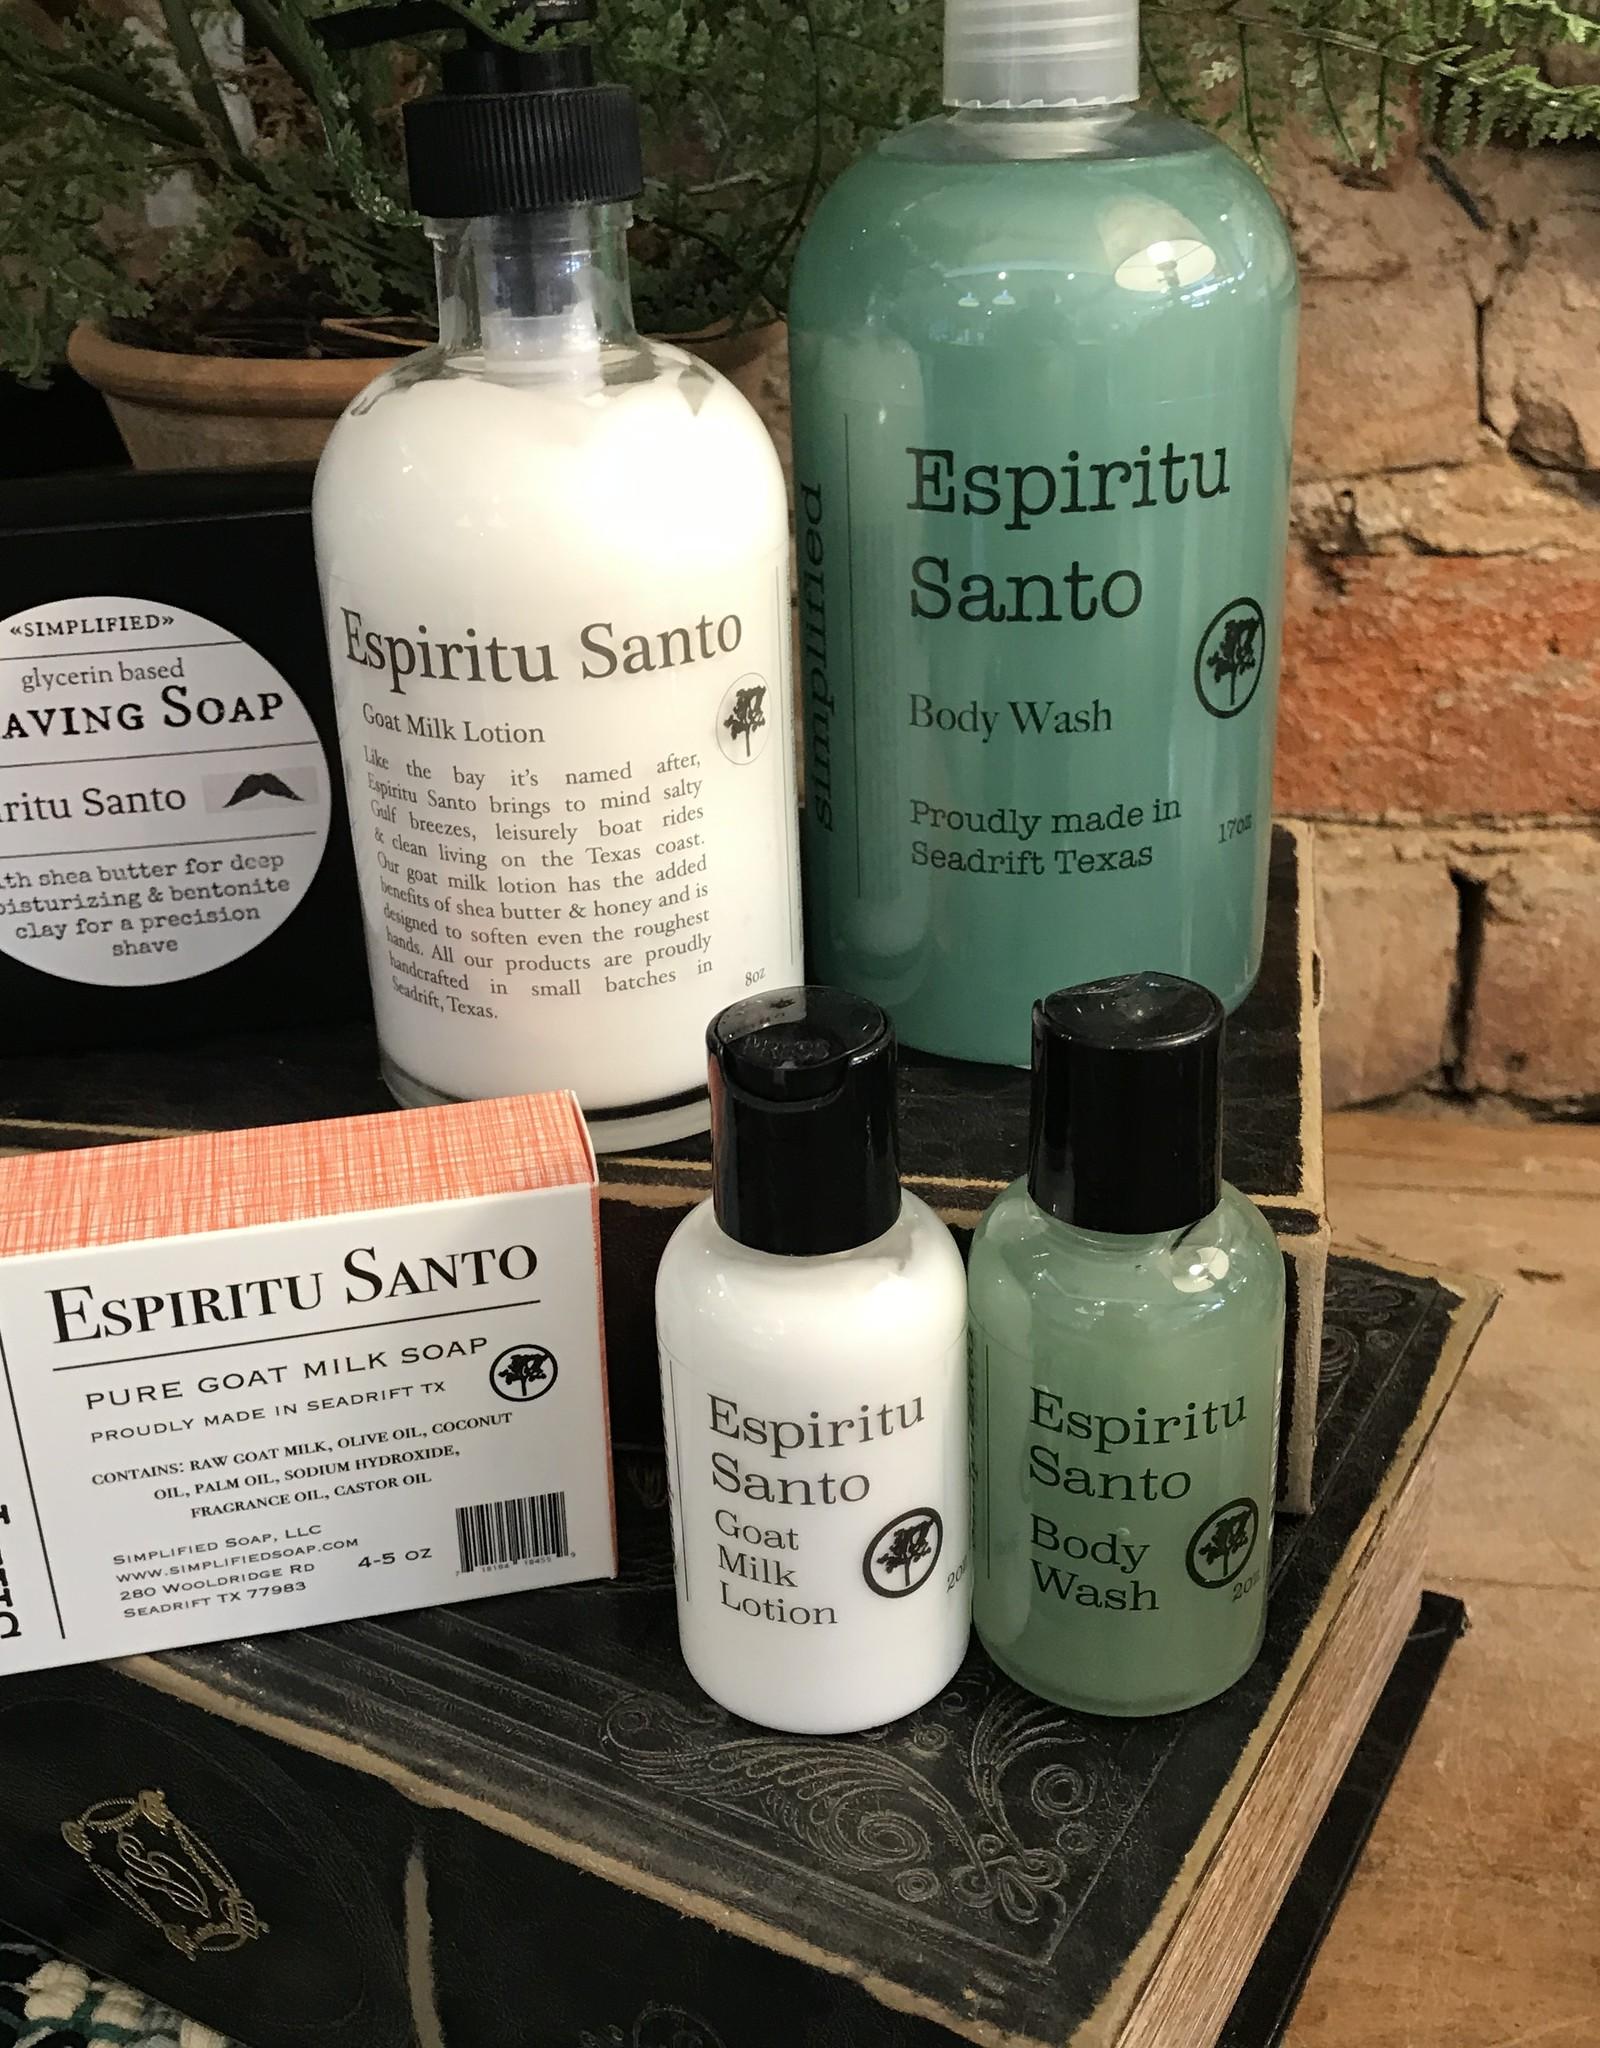 Shave Soap 5 oz - Espiritu Santo